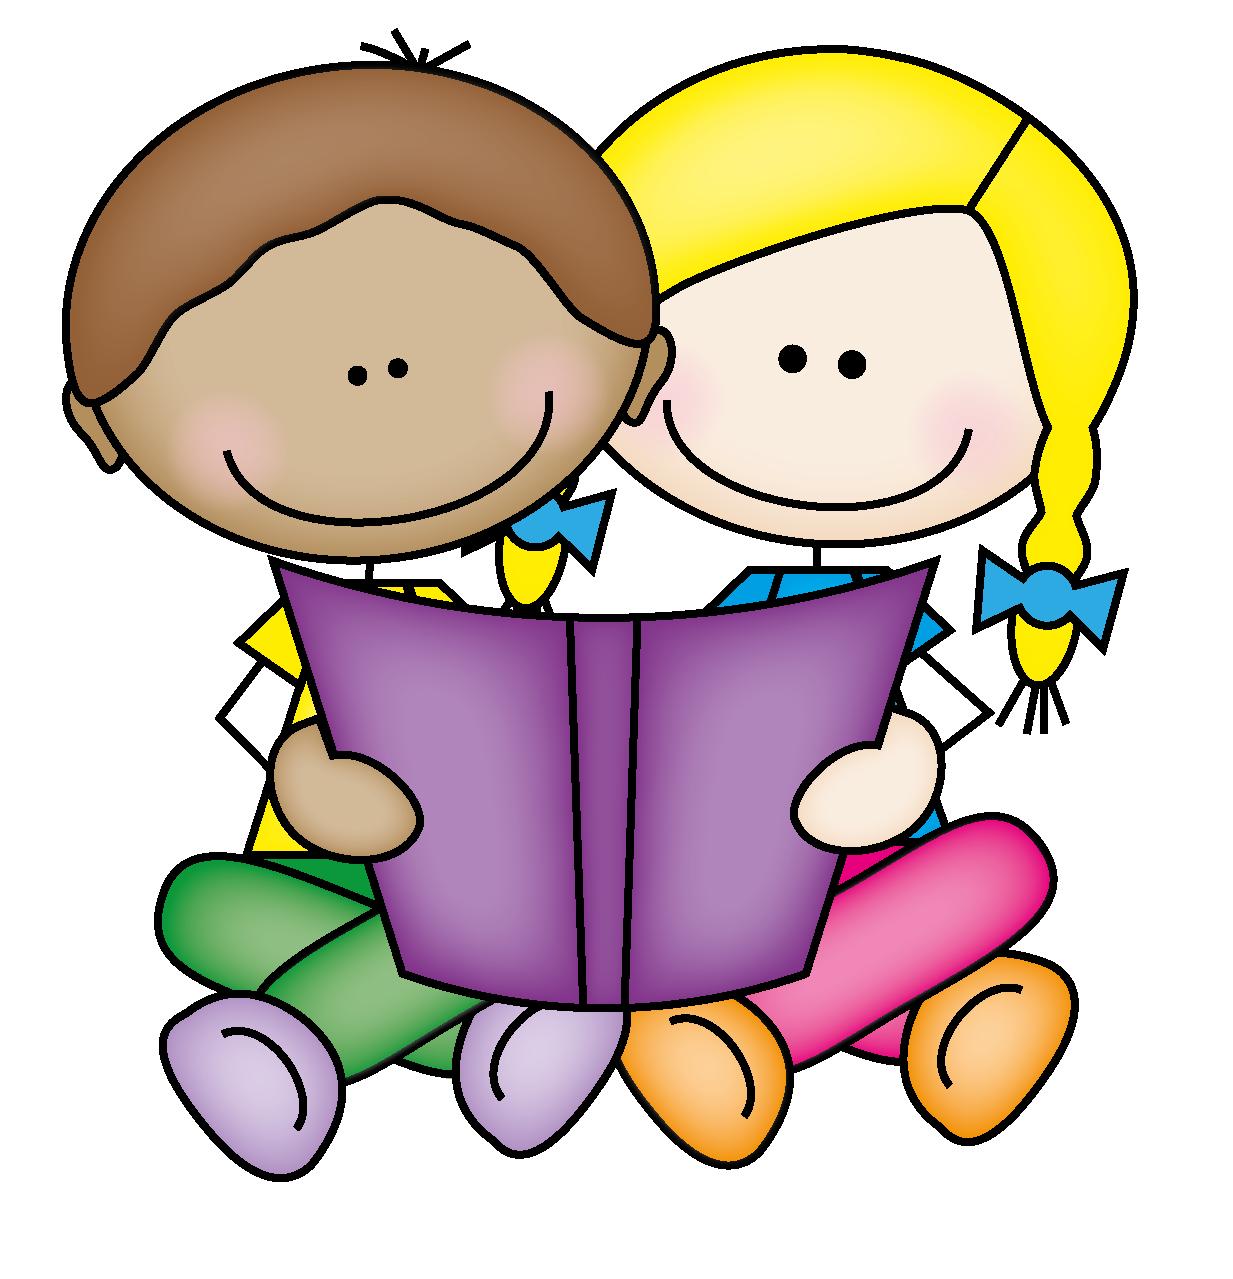 Kids Reading Clipart - ... Hope Everyone-Kids reading clipart - ... Hope Everyone Enjoyed Our Book .-8